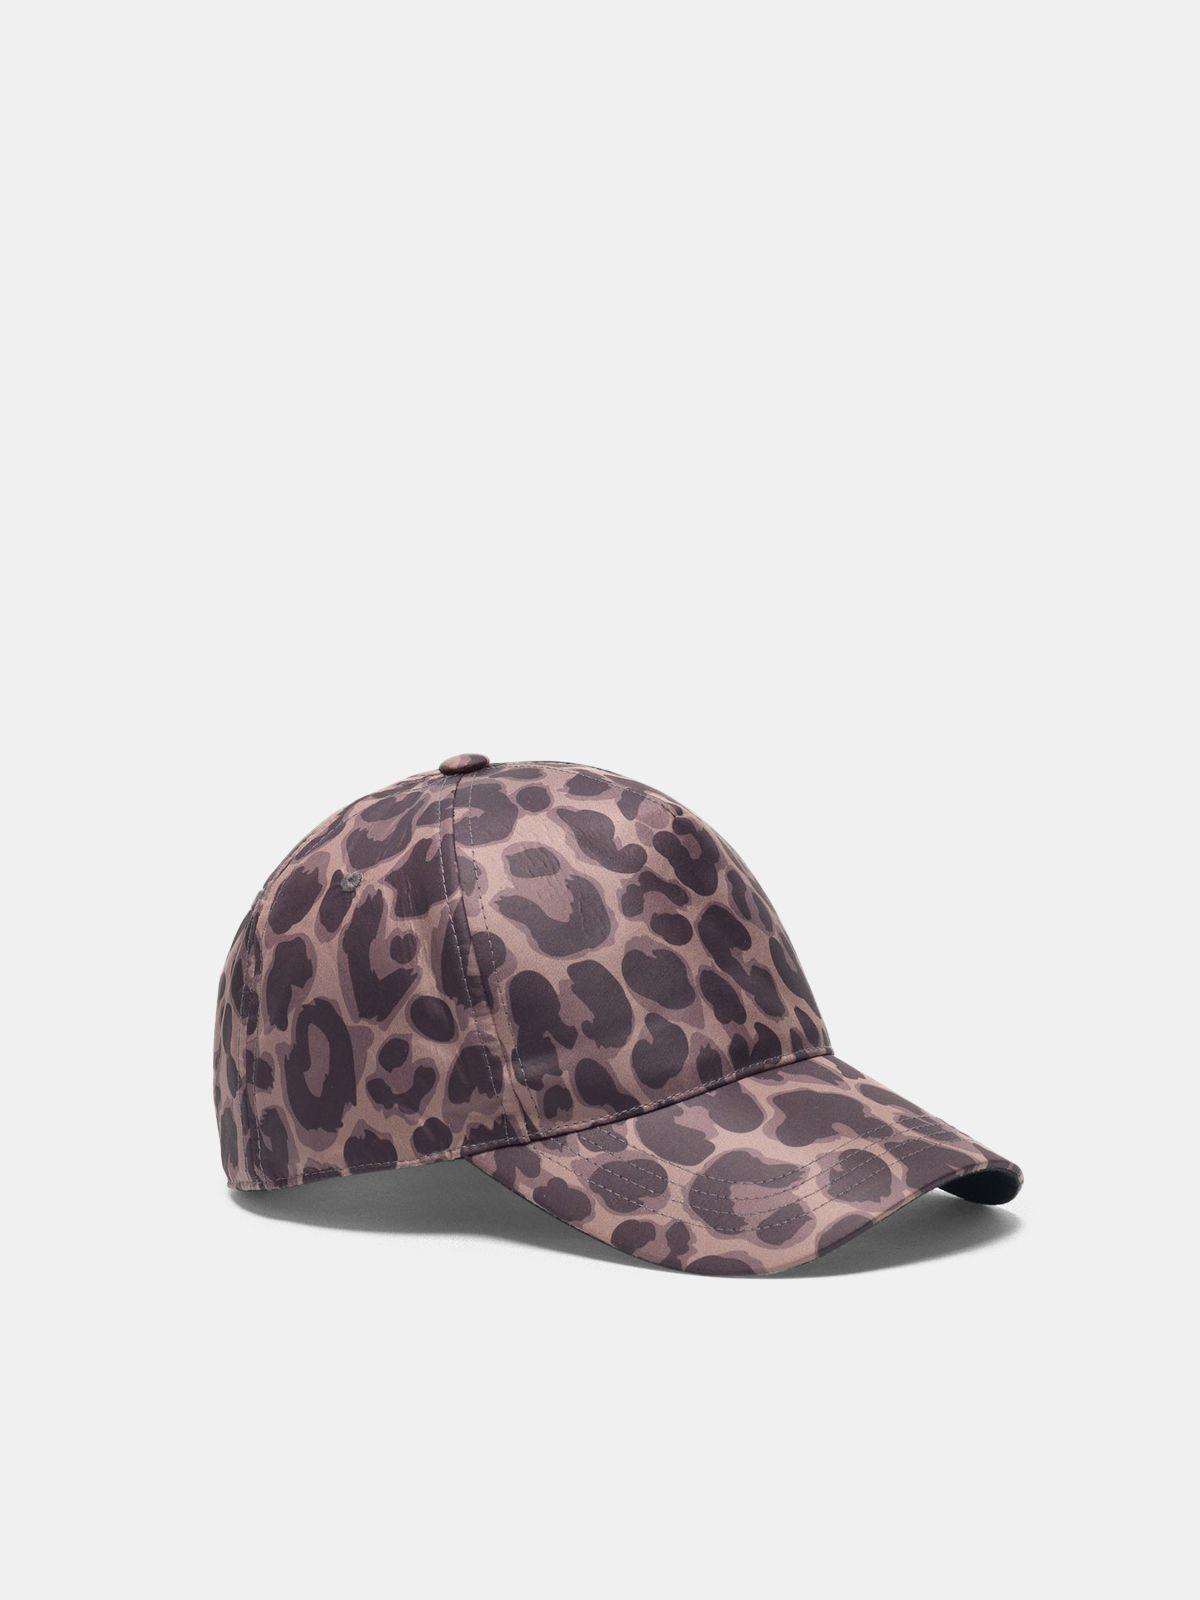 Golden Goose - Panji nylon baseball cap with jaguar print in